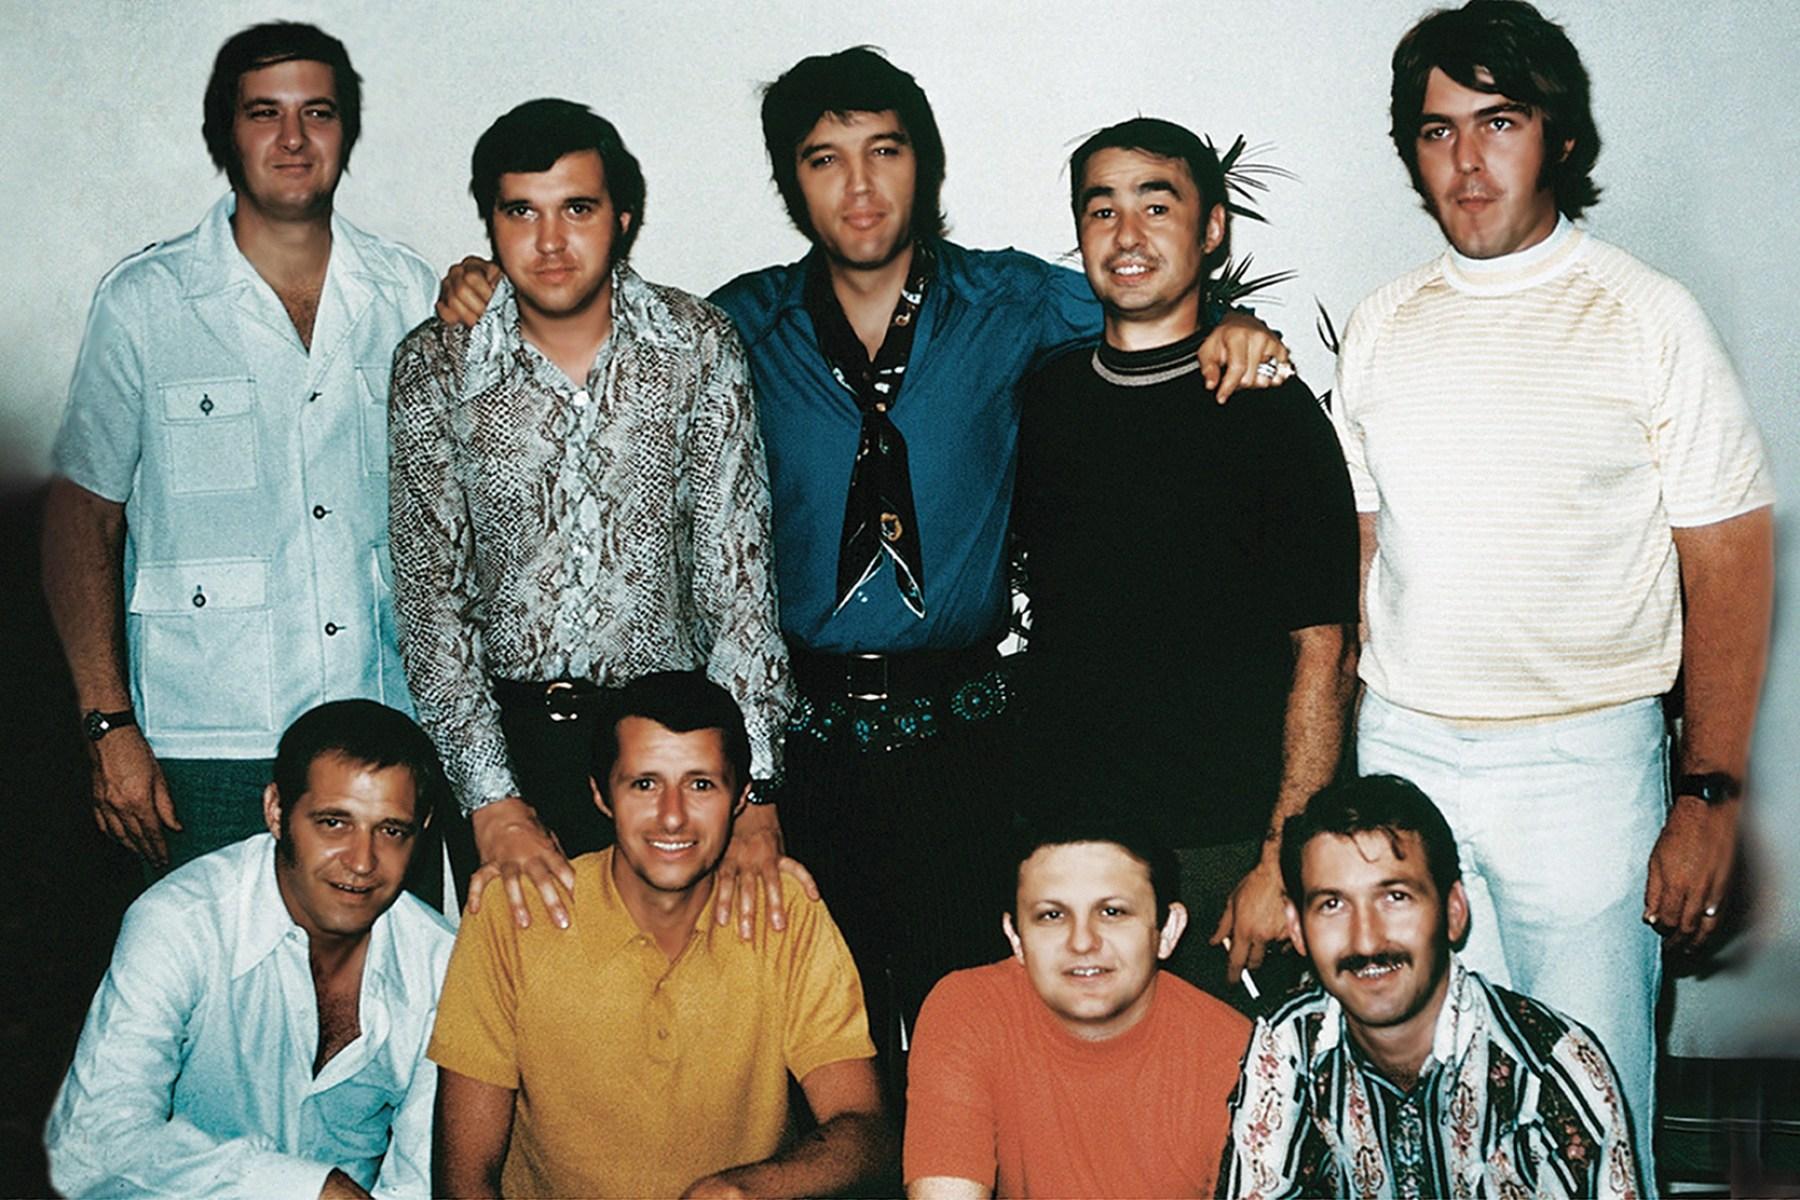 Elvis Presley, Nashville Cats